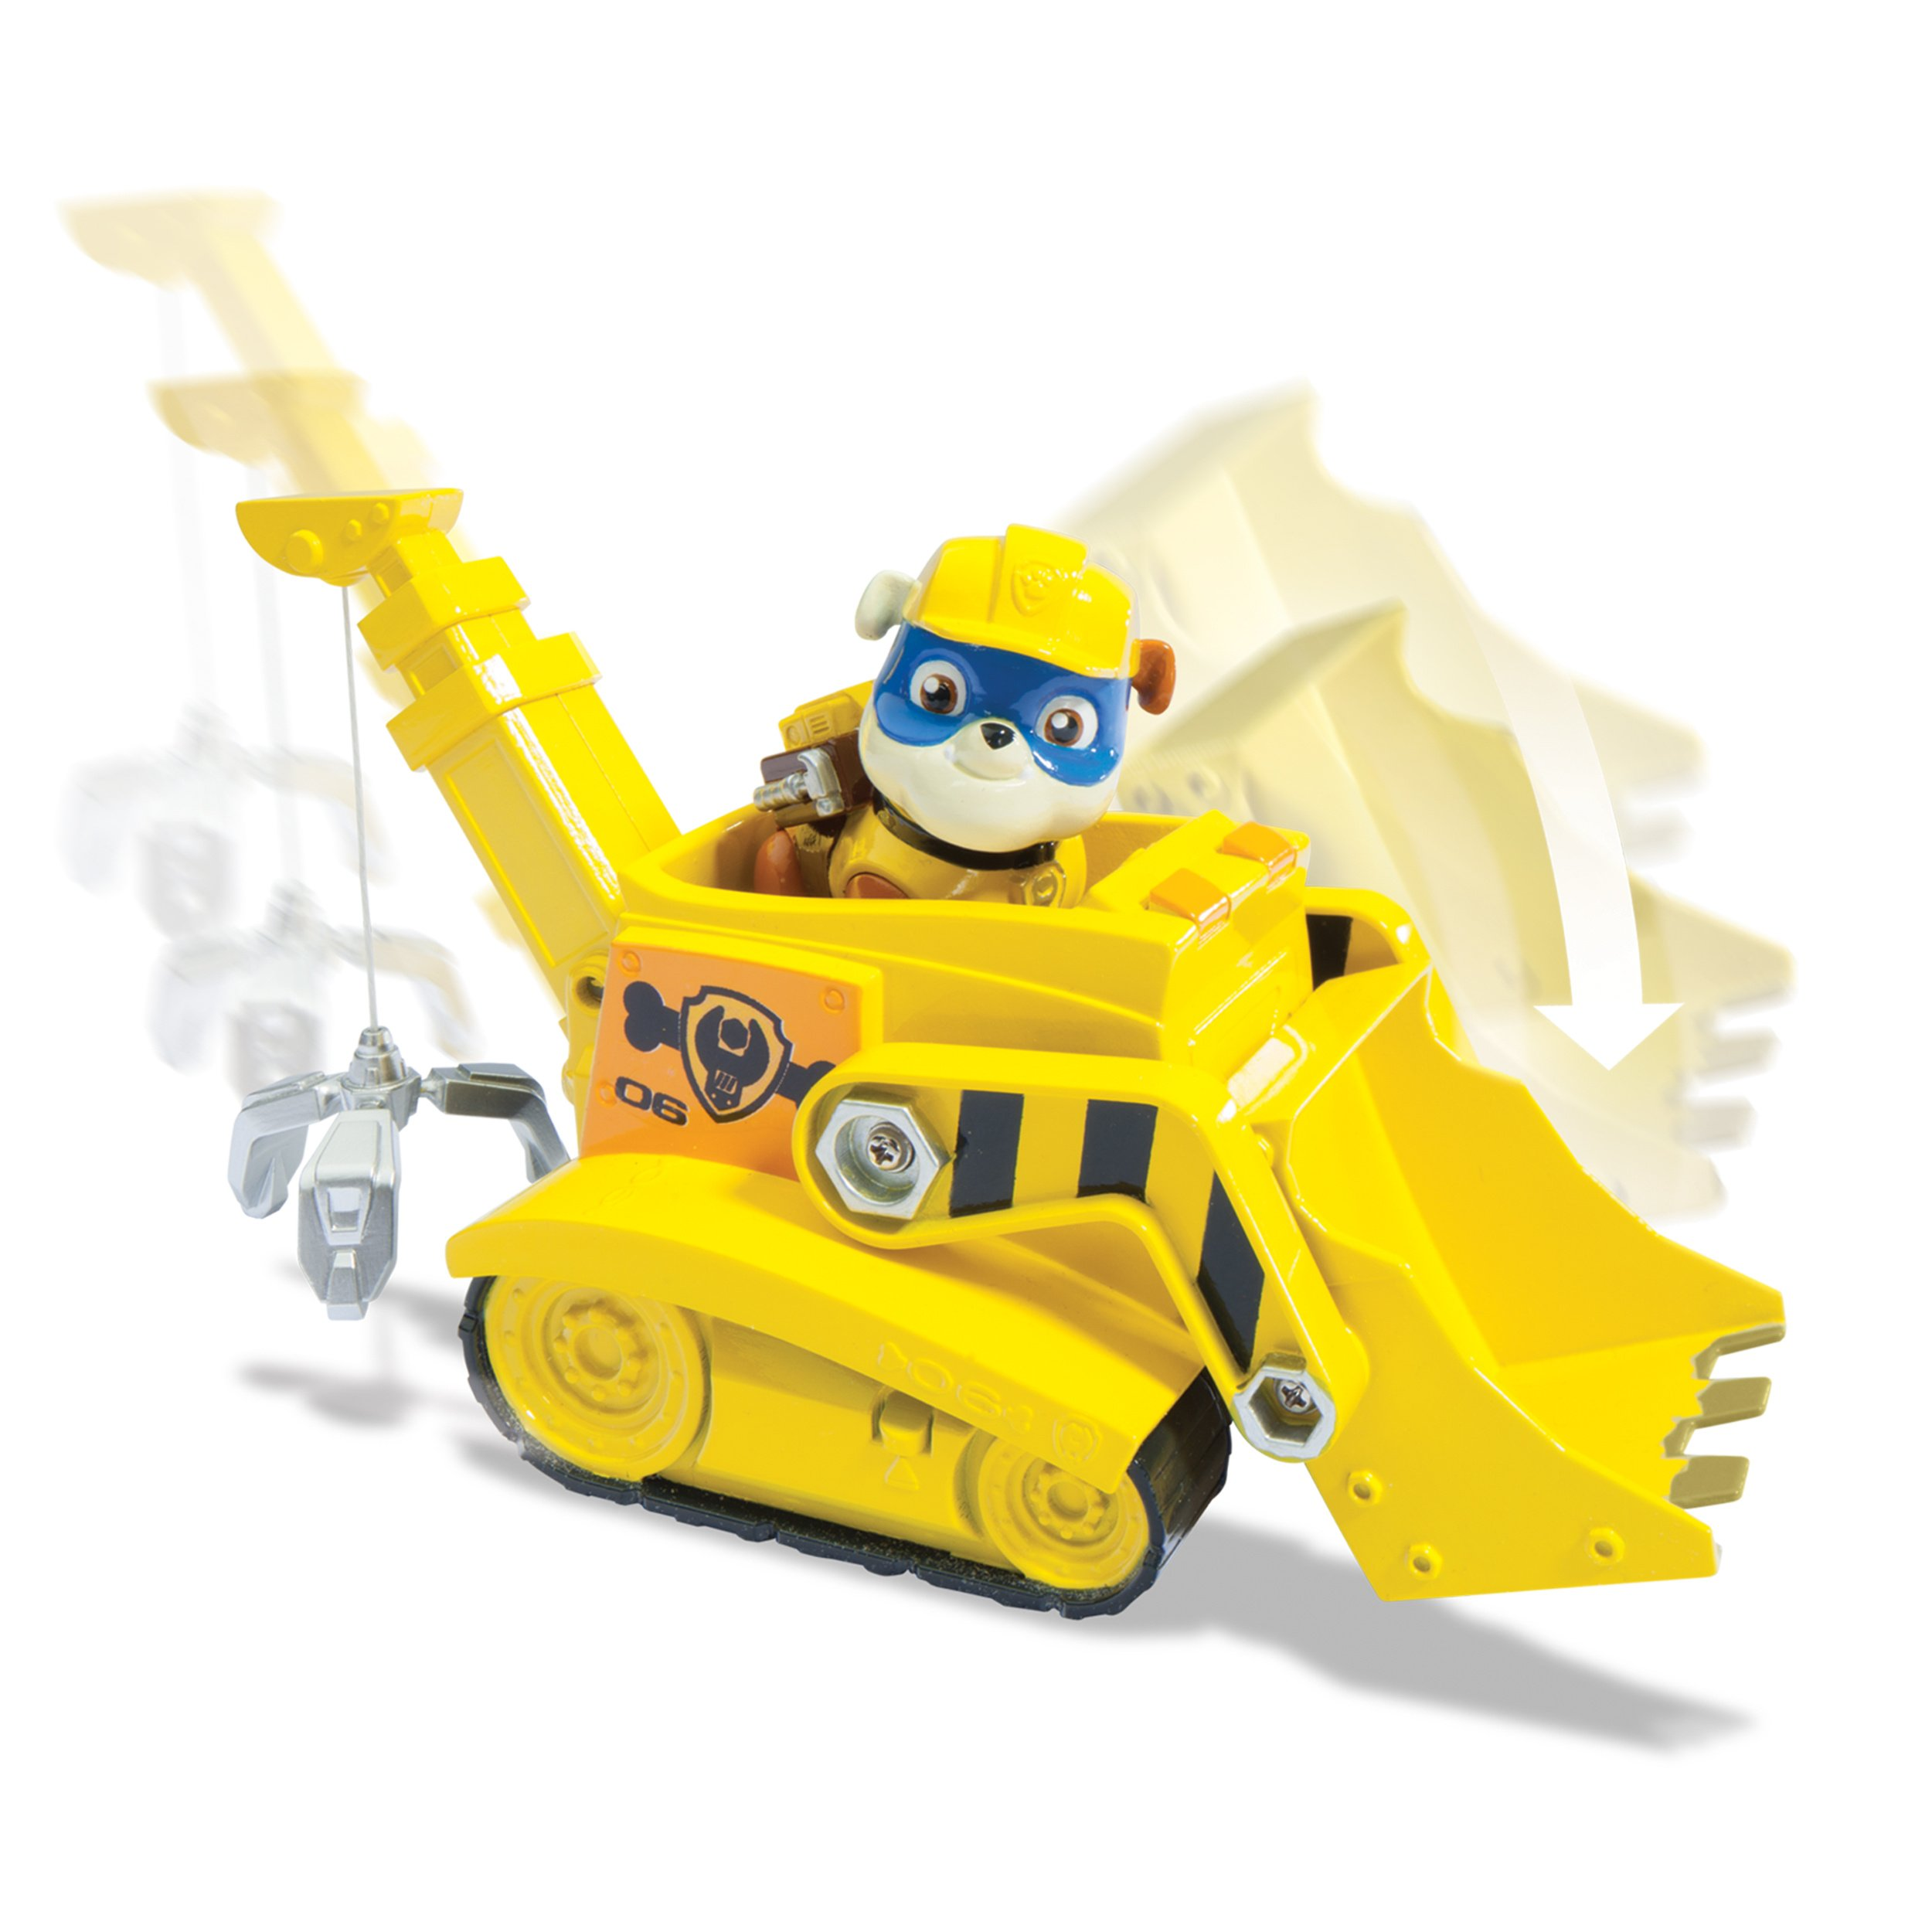 Paw Patrol Super Pup Rubble's Crane, Vehicle Figure by Paw Patrol (Image #4)